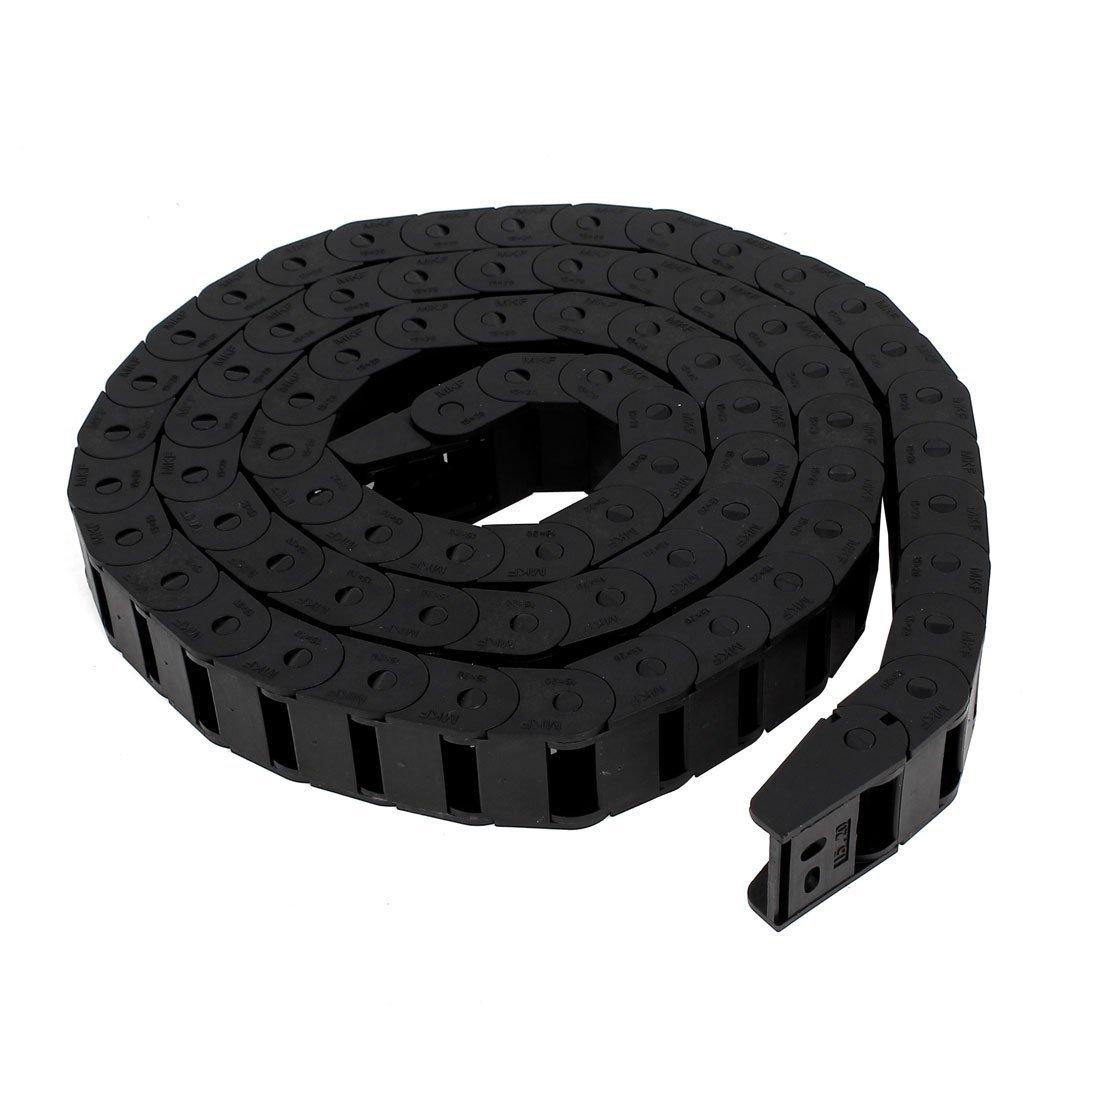 15x20mm de plá stico semi flexible de 152 cm de cadena de arrastre cerrado portacables DealMux DLM-B00X7C0MS8